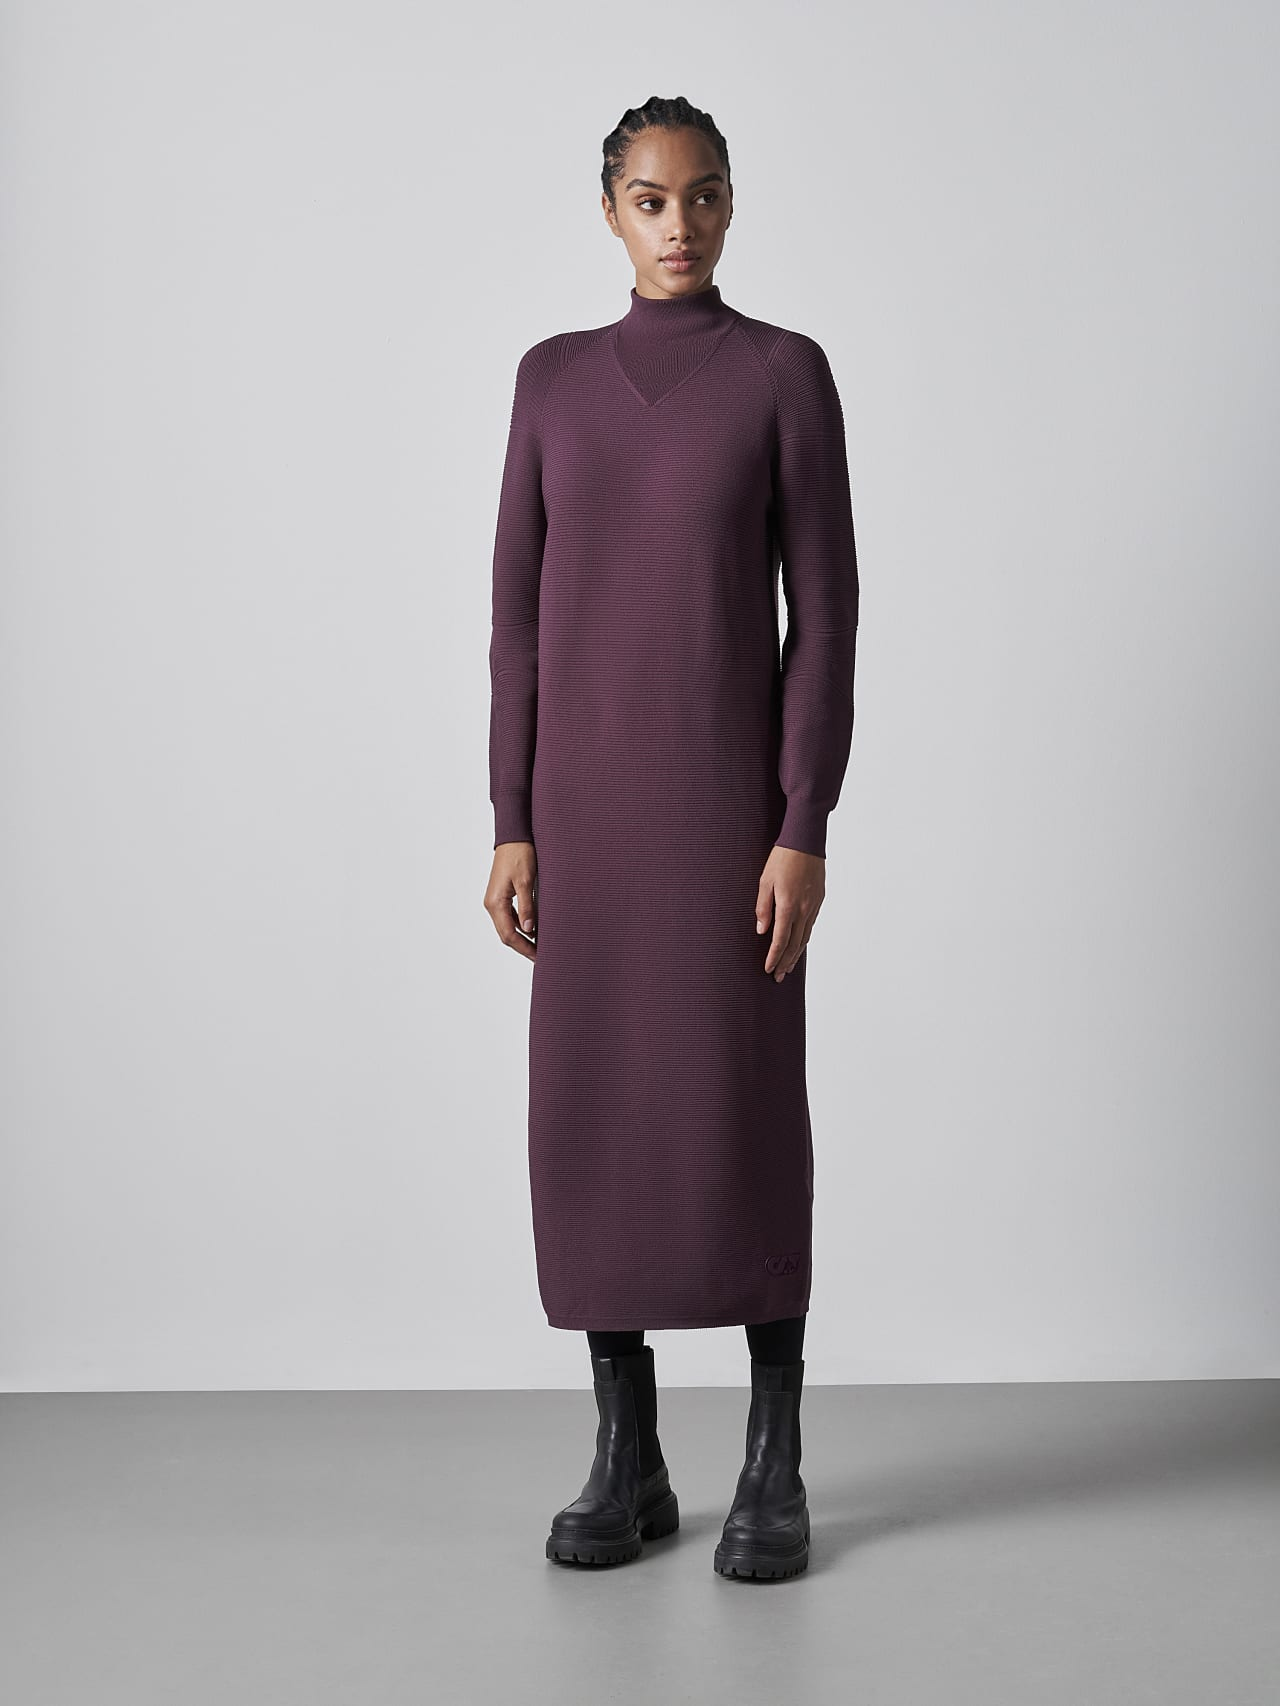 FOXEE V1.Y5.02 Seamless 3D Knit Mock-Neck Dress Burgundy Model shot Alpha Tauri